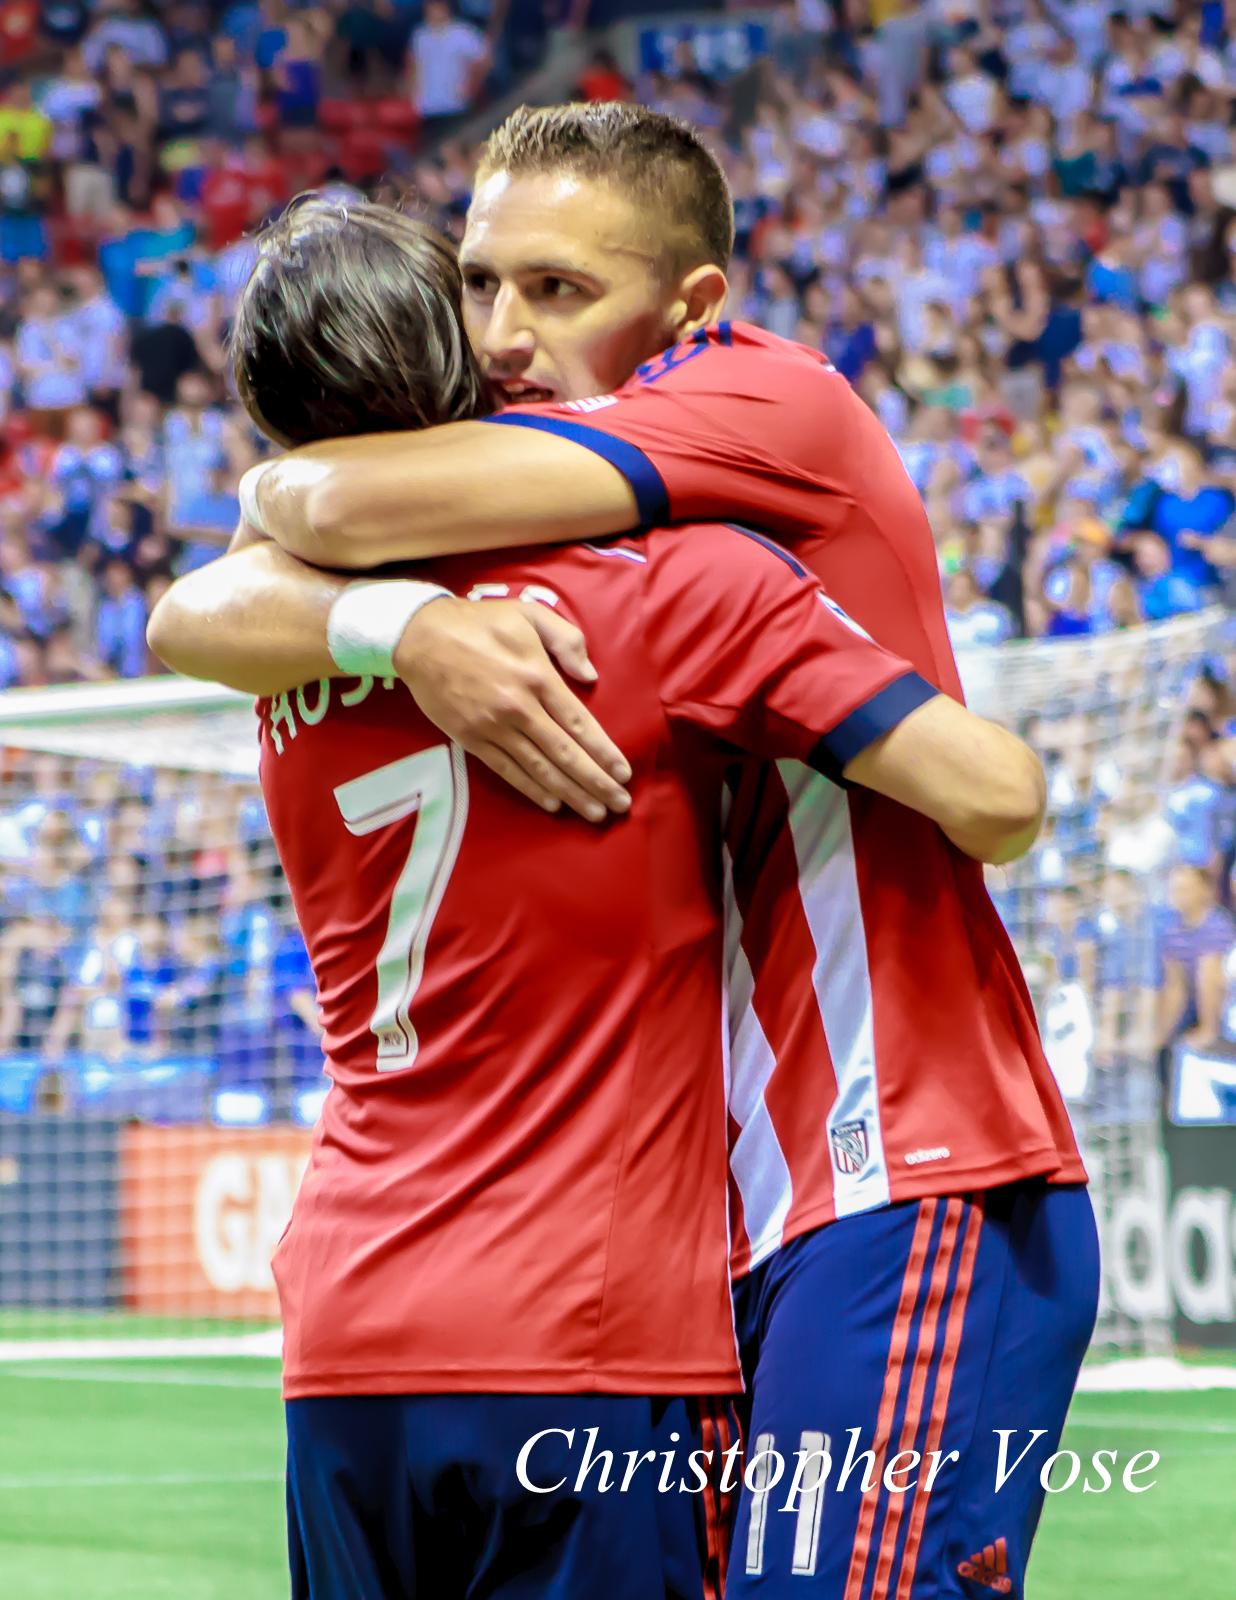 2014-07-12 Leandro Barrera Goal Celebration 2.jpg